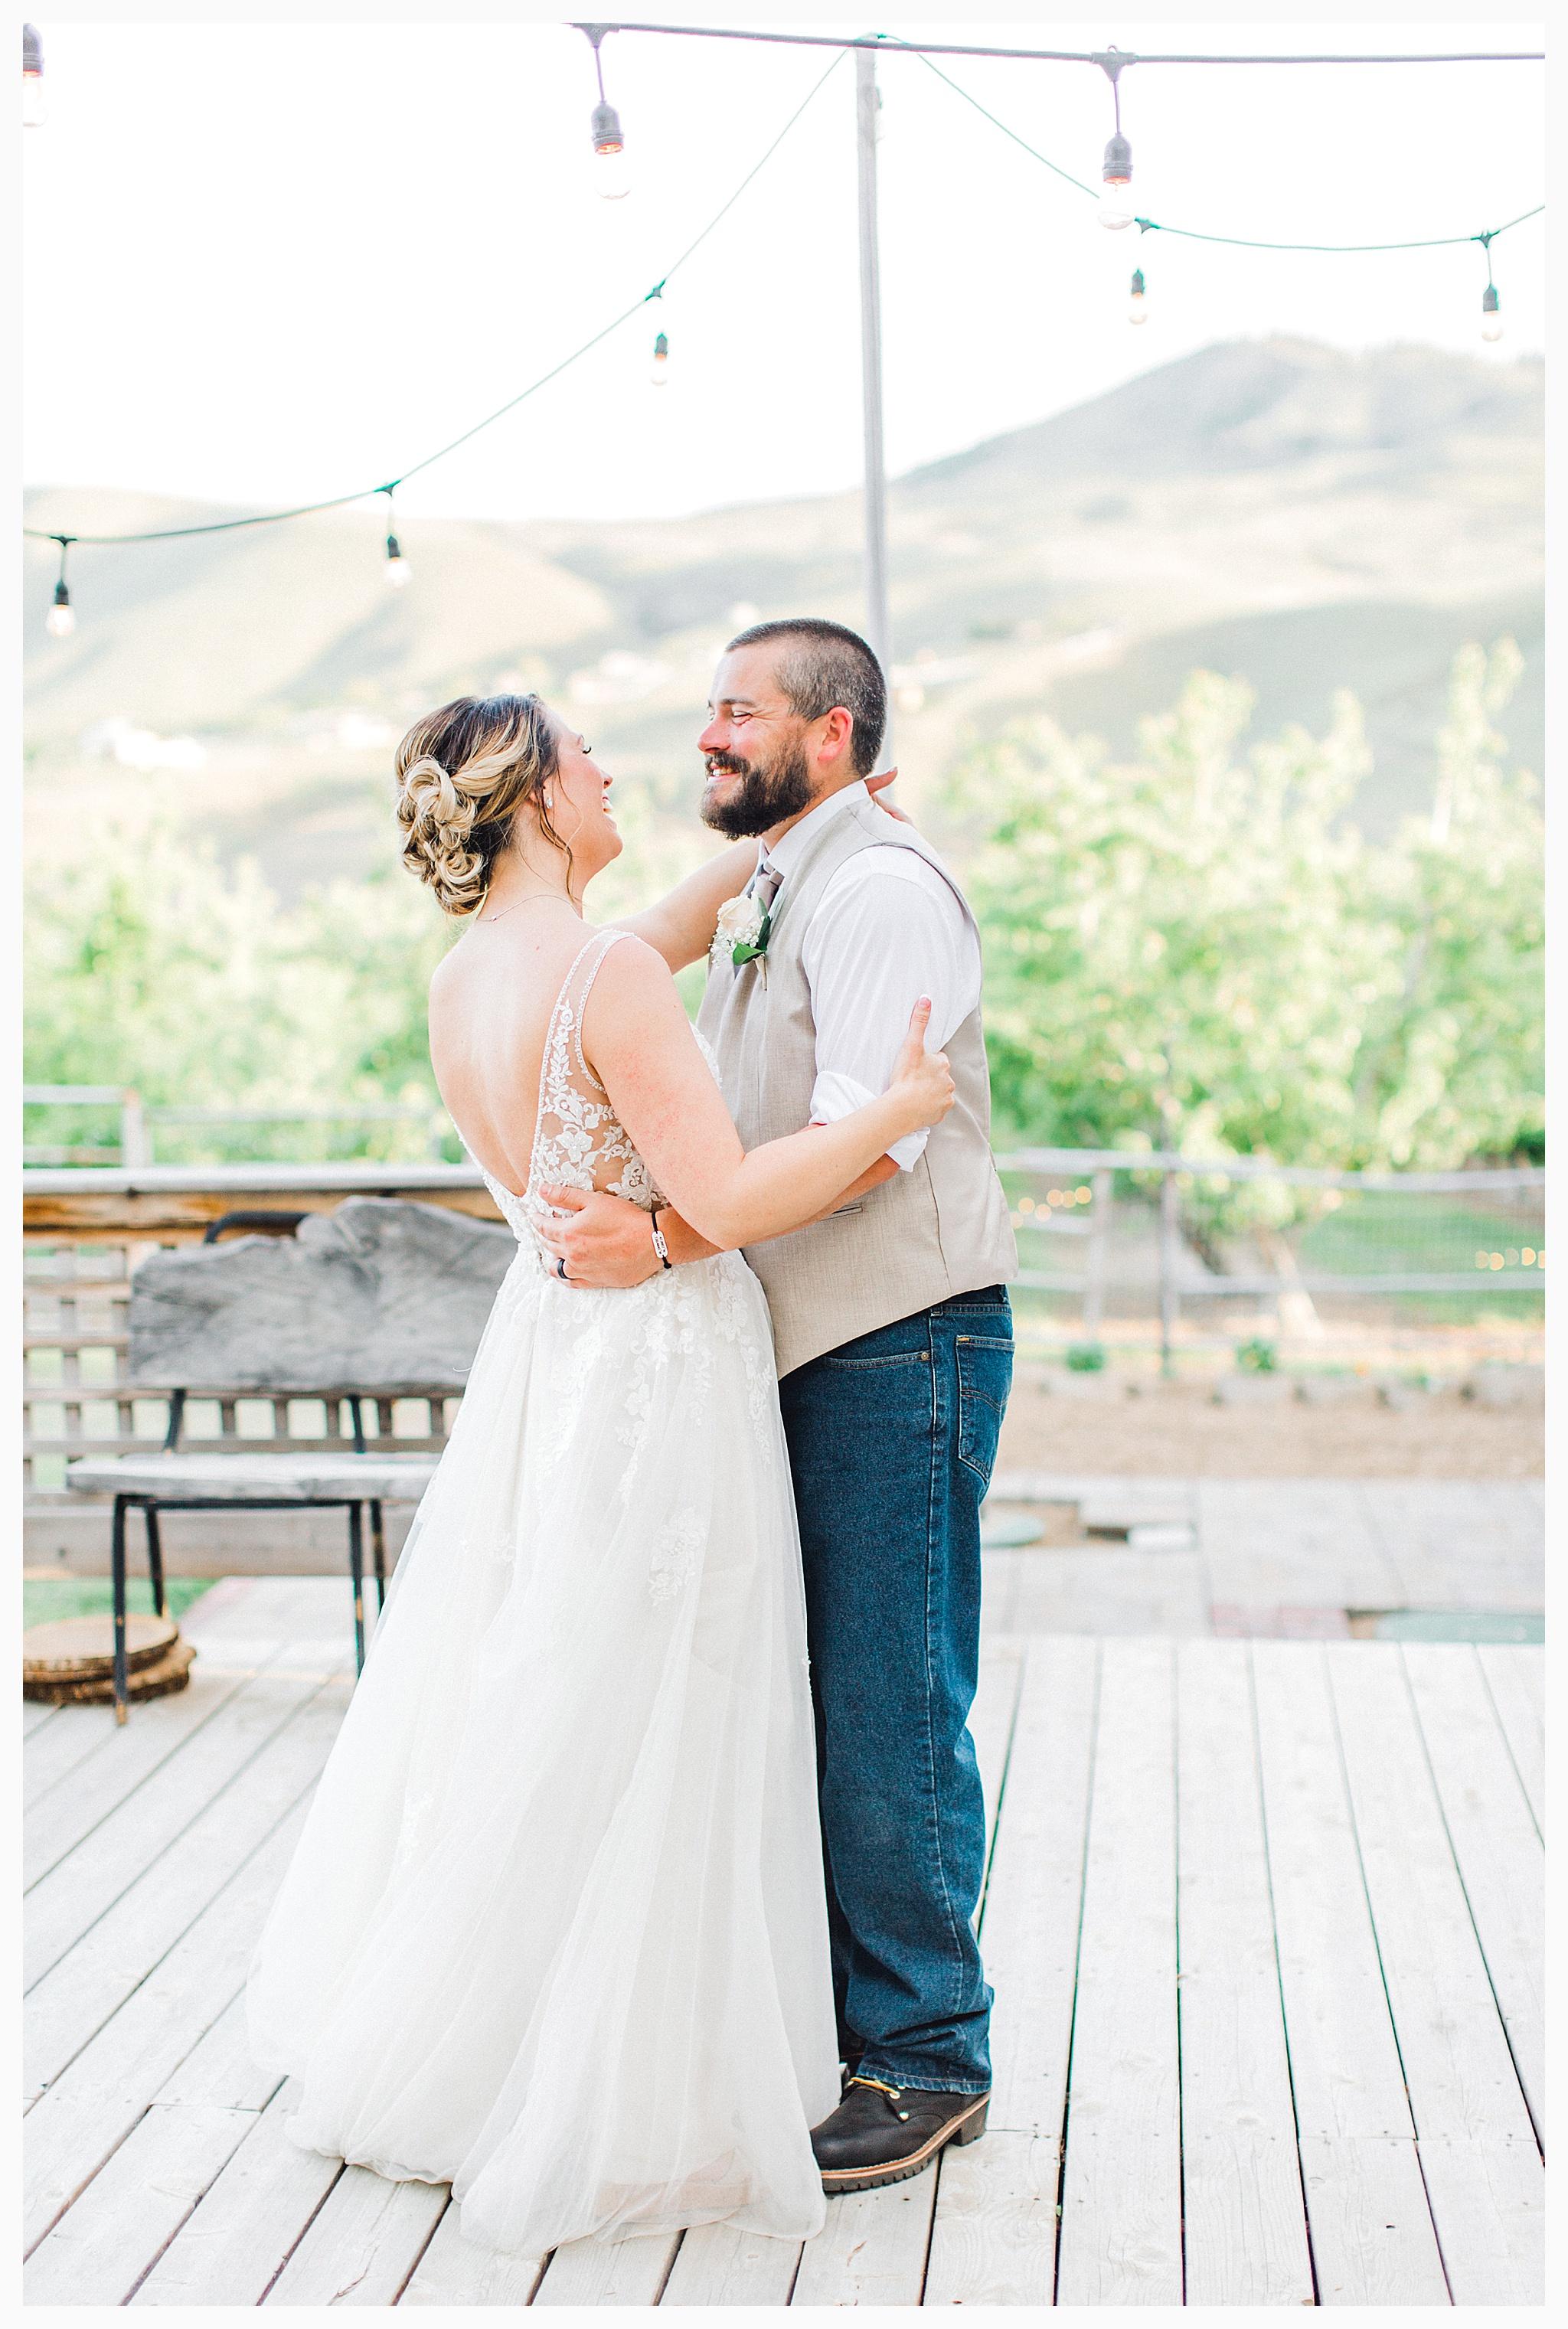 Rustic barn wedding in Wenatchee Washington at Sunshine Ranch on Easy Street, Emma Rose Company Seattle PNW Light and Airy Wedding Photographer_0103.jpg